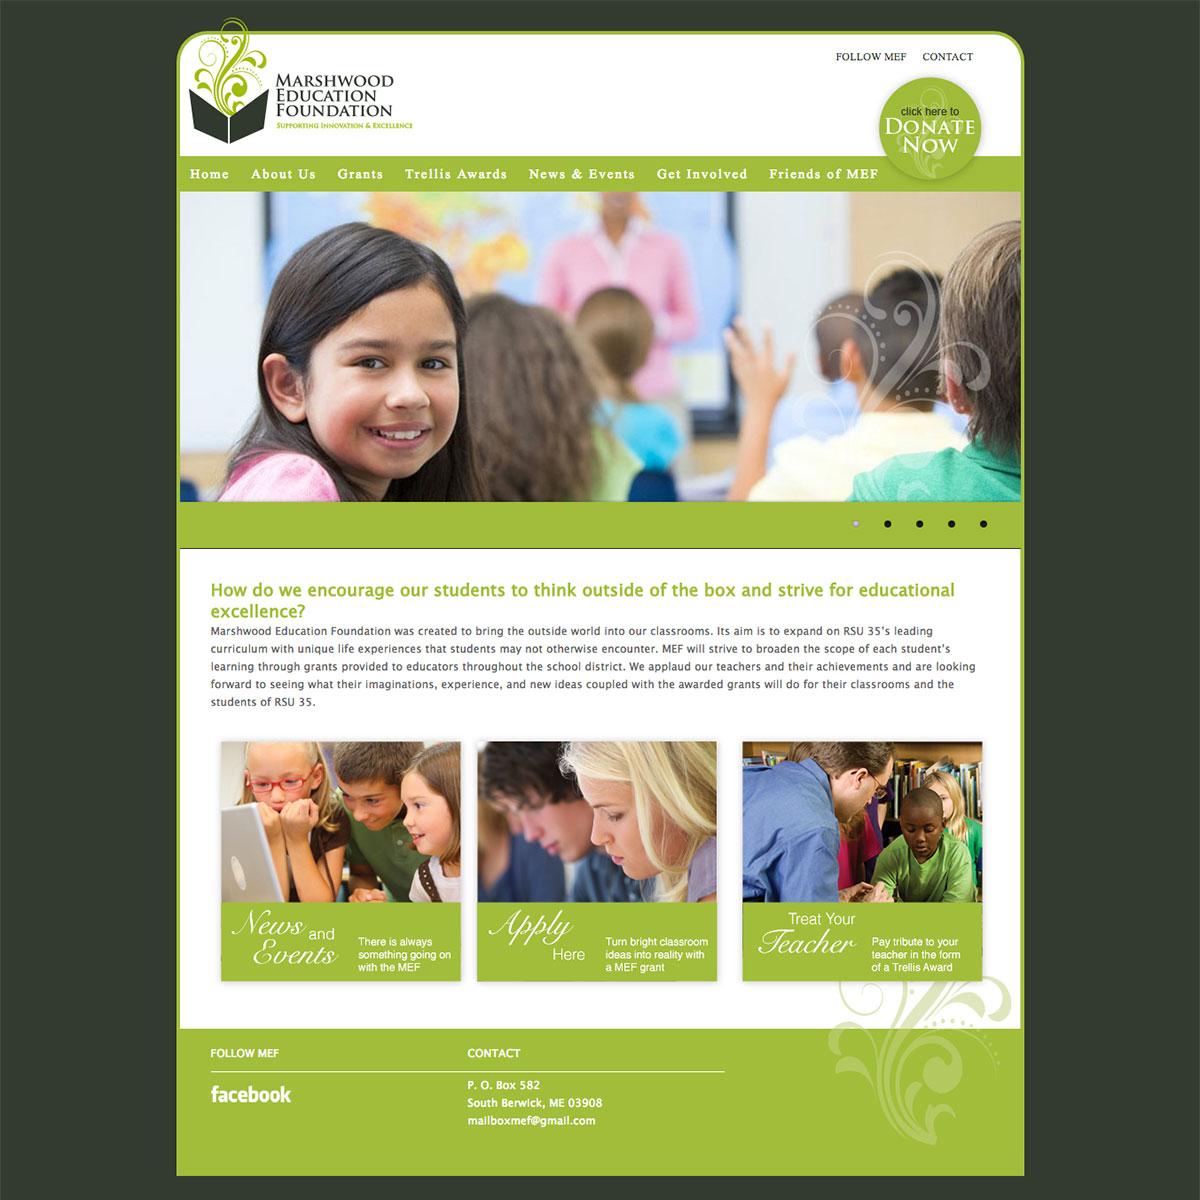 Marshwood Education Foundation website by ModSpot